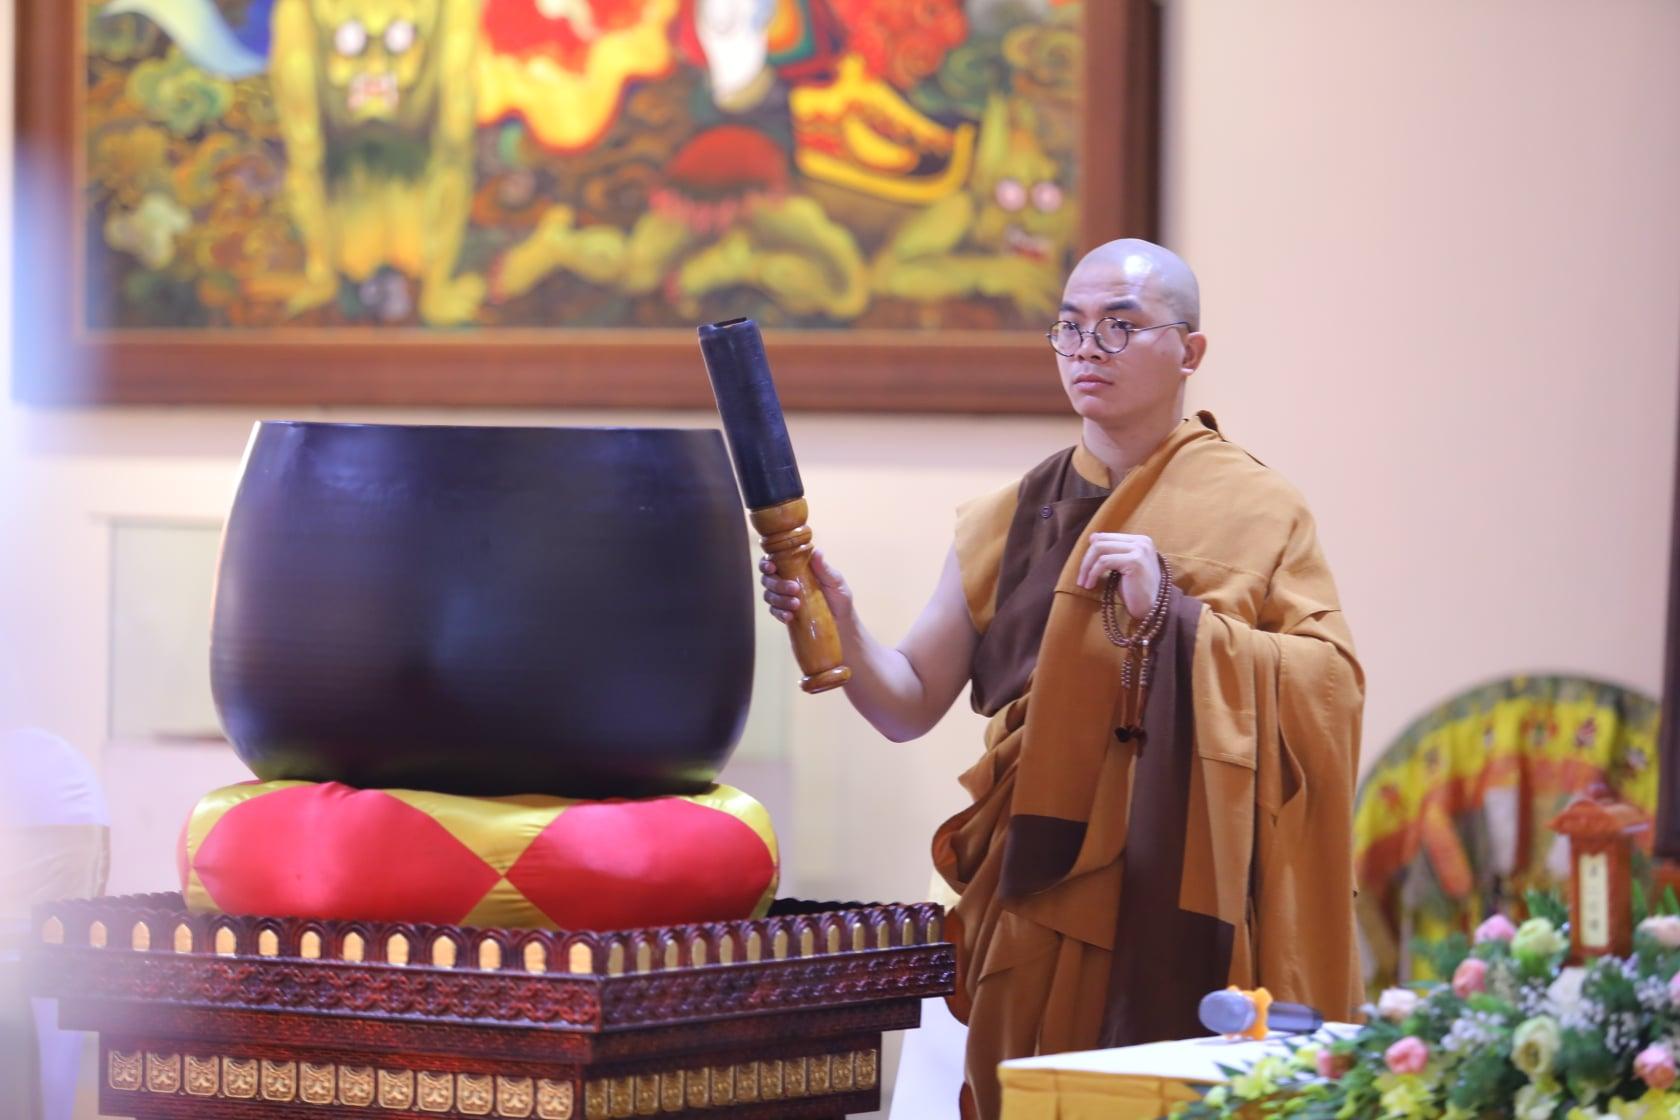 Thang Nghiem Dai Gioi Dan IV (101)